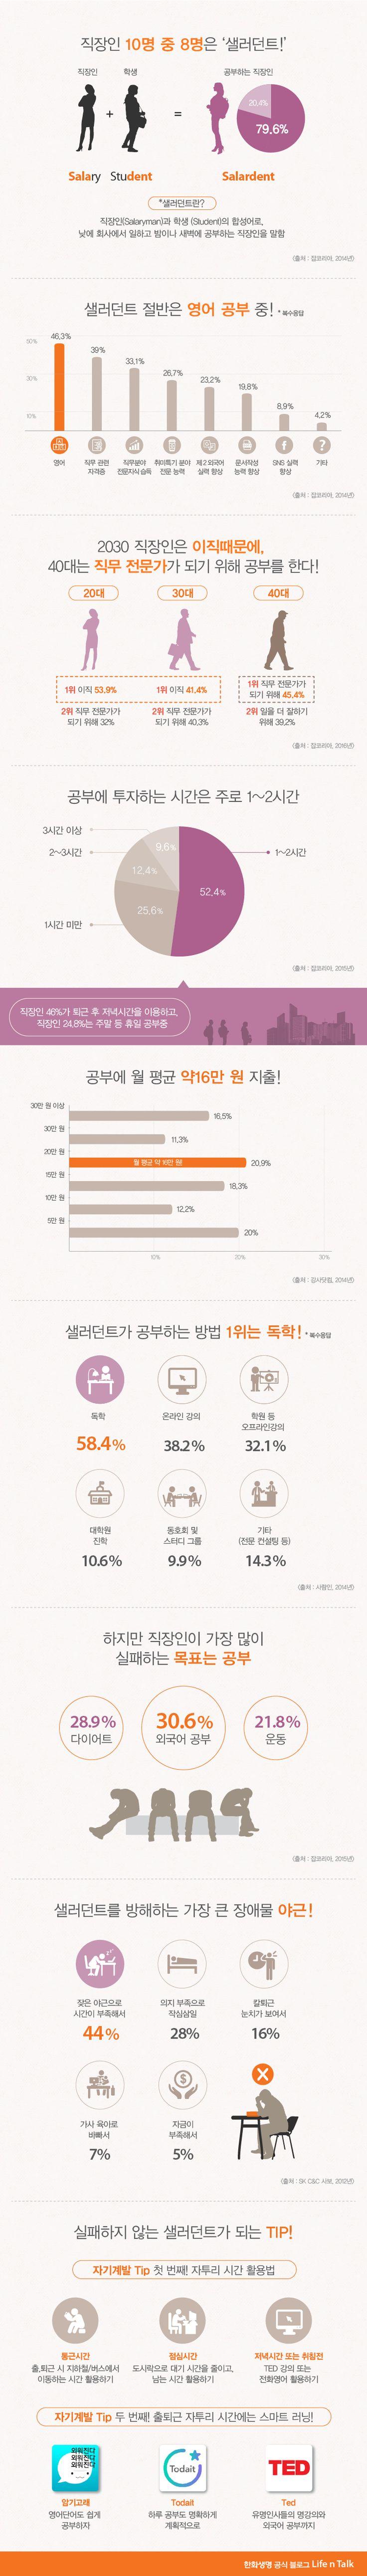 [Infographic] 공부하는 직장인 샐러던트에 관한 인포그래픽